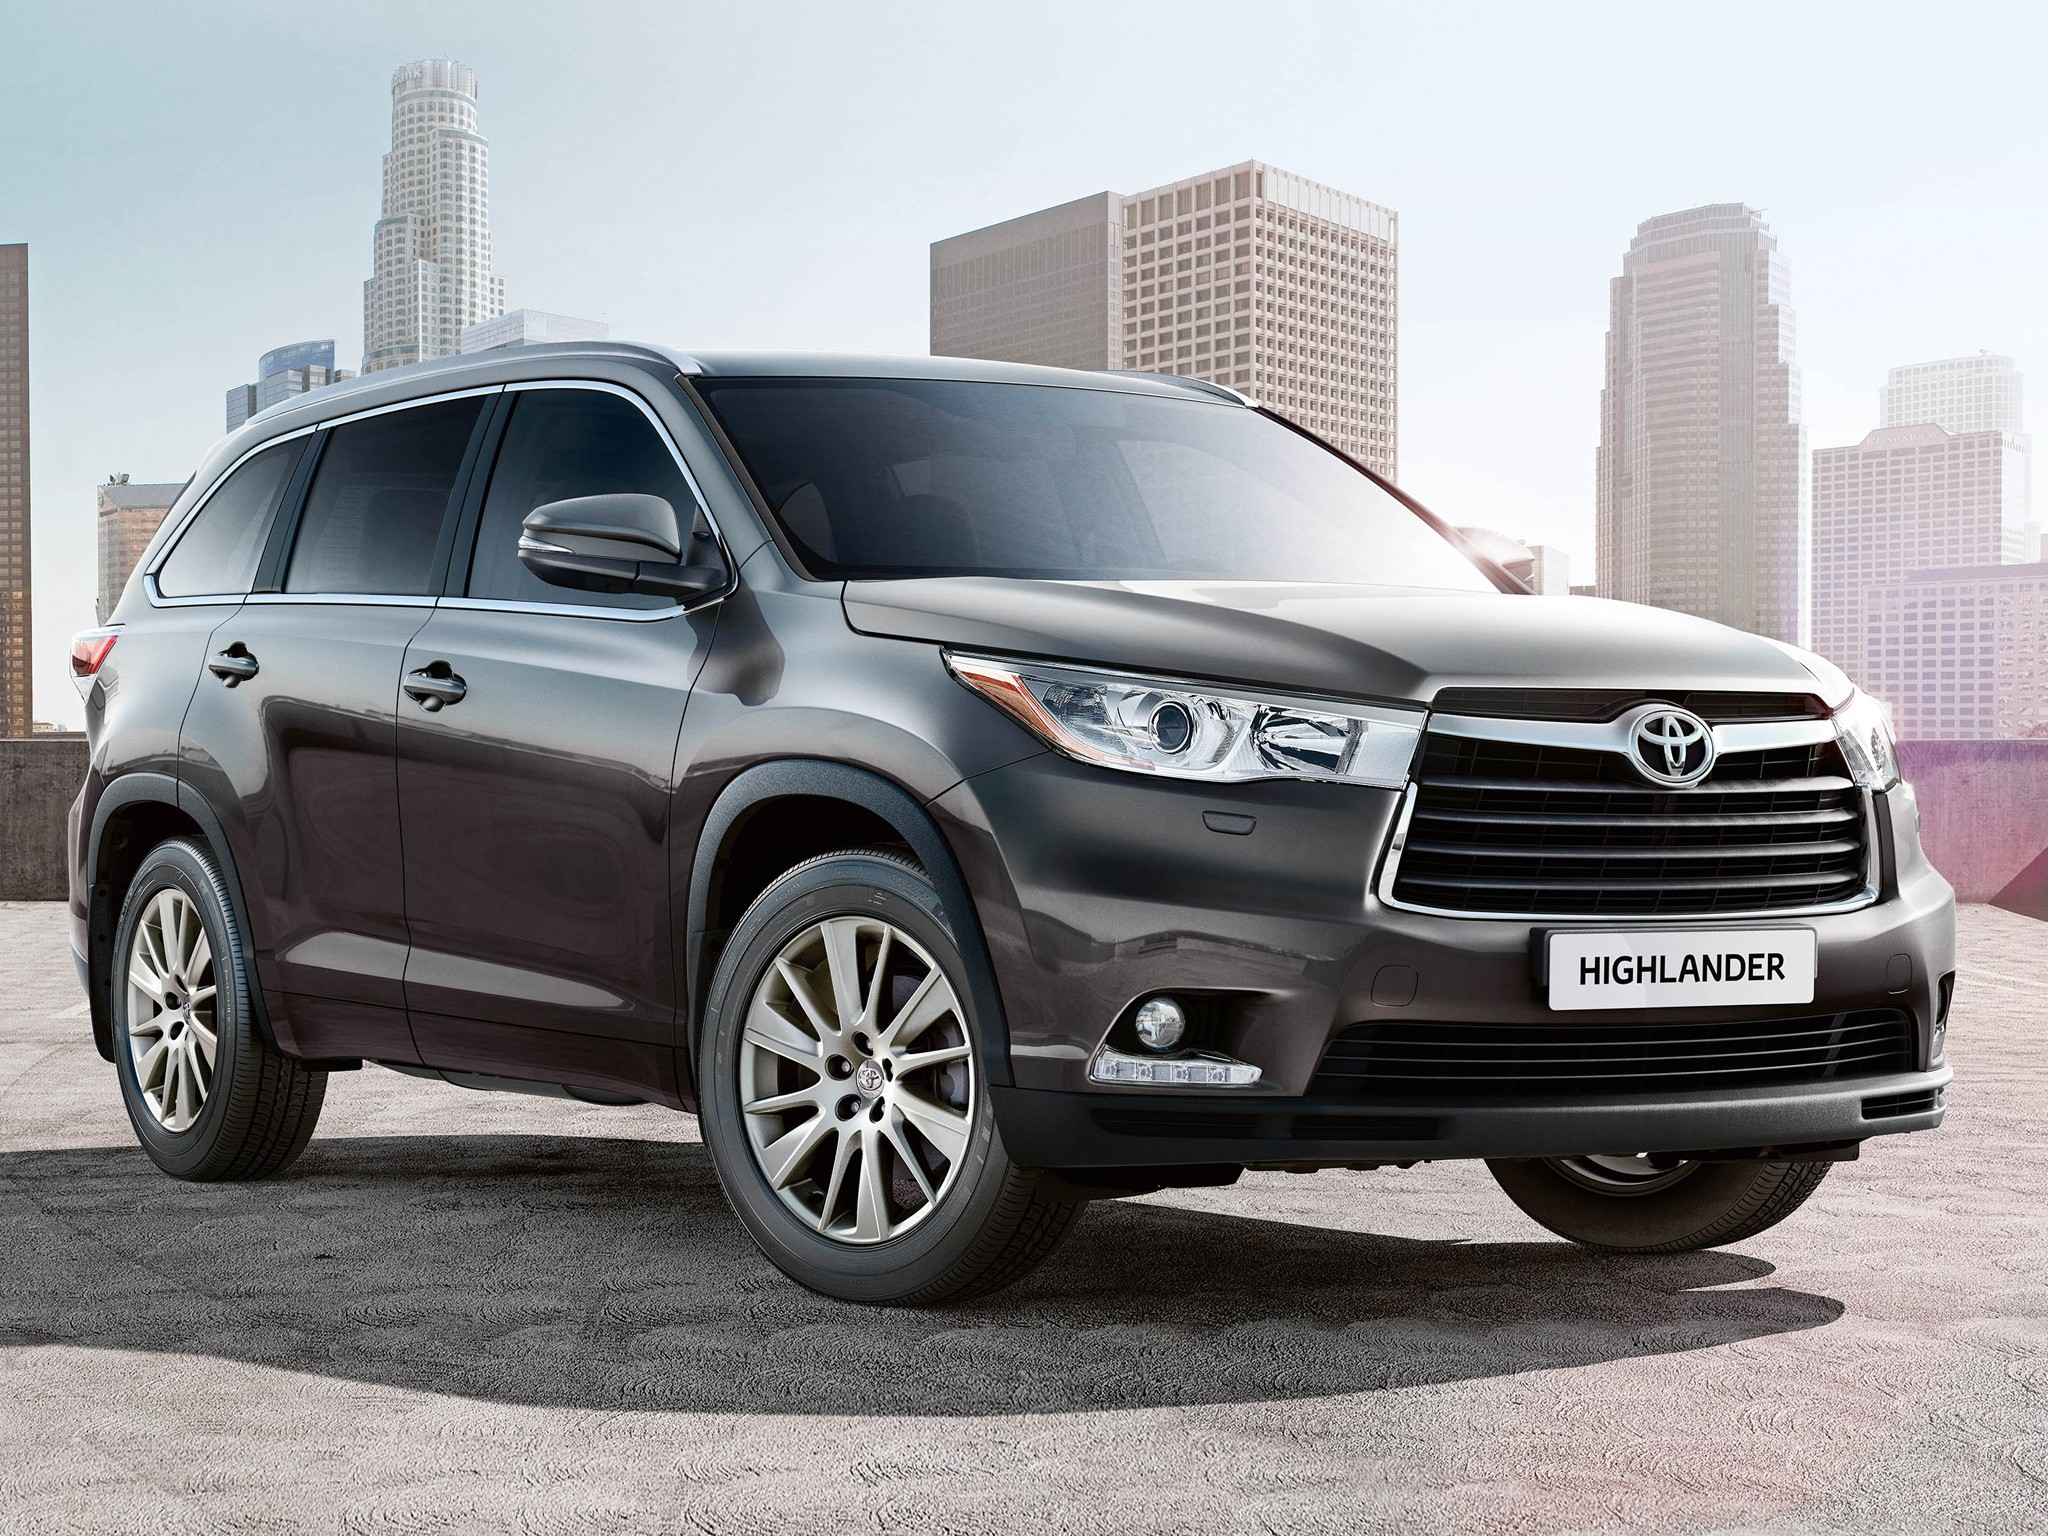 Toyota Highlander  Pricing Ratings Reviews  Kelley